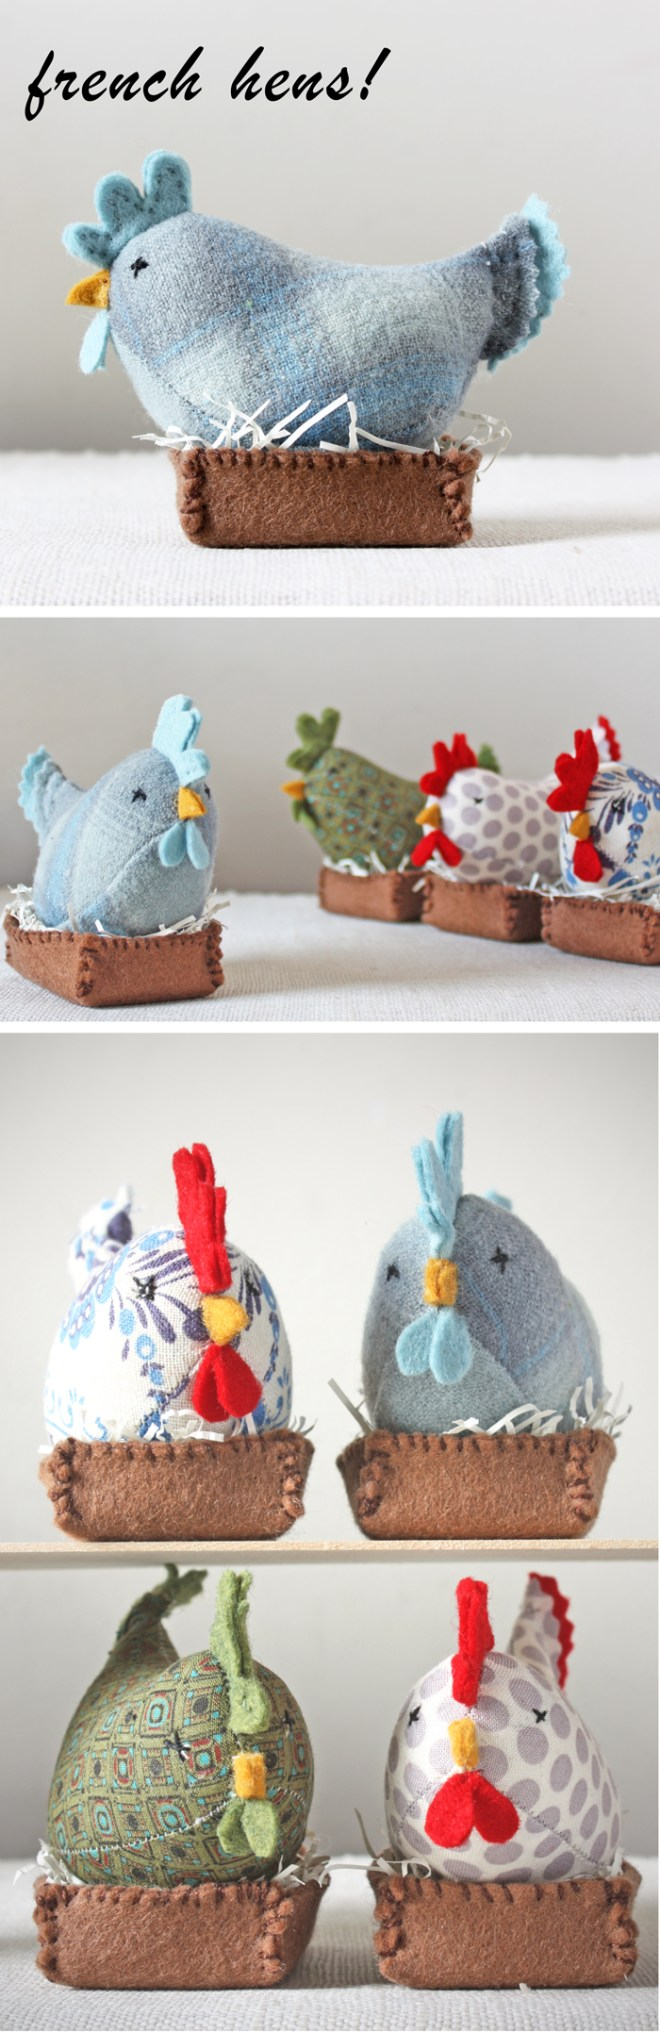 ann wood : french hens